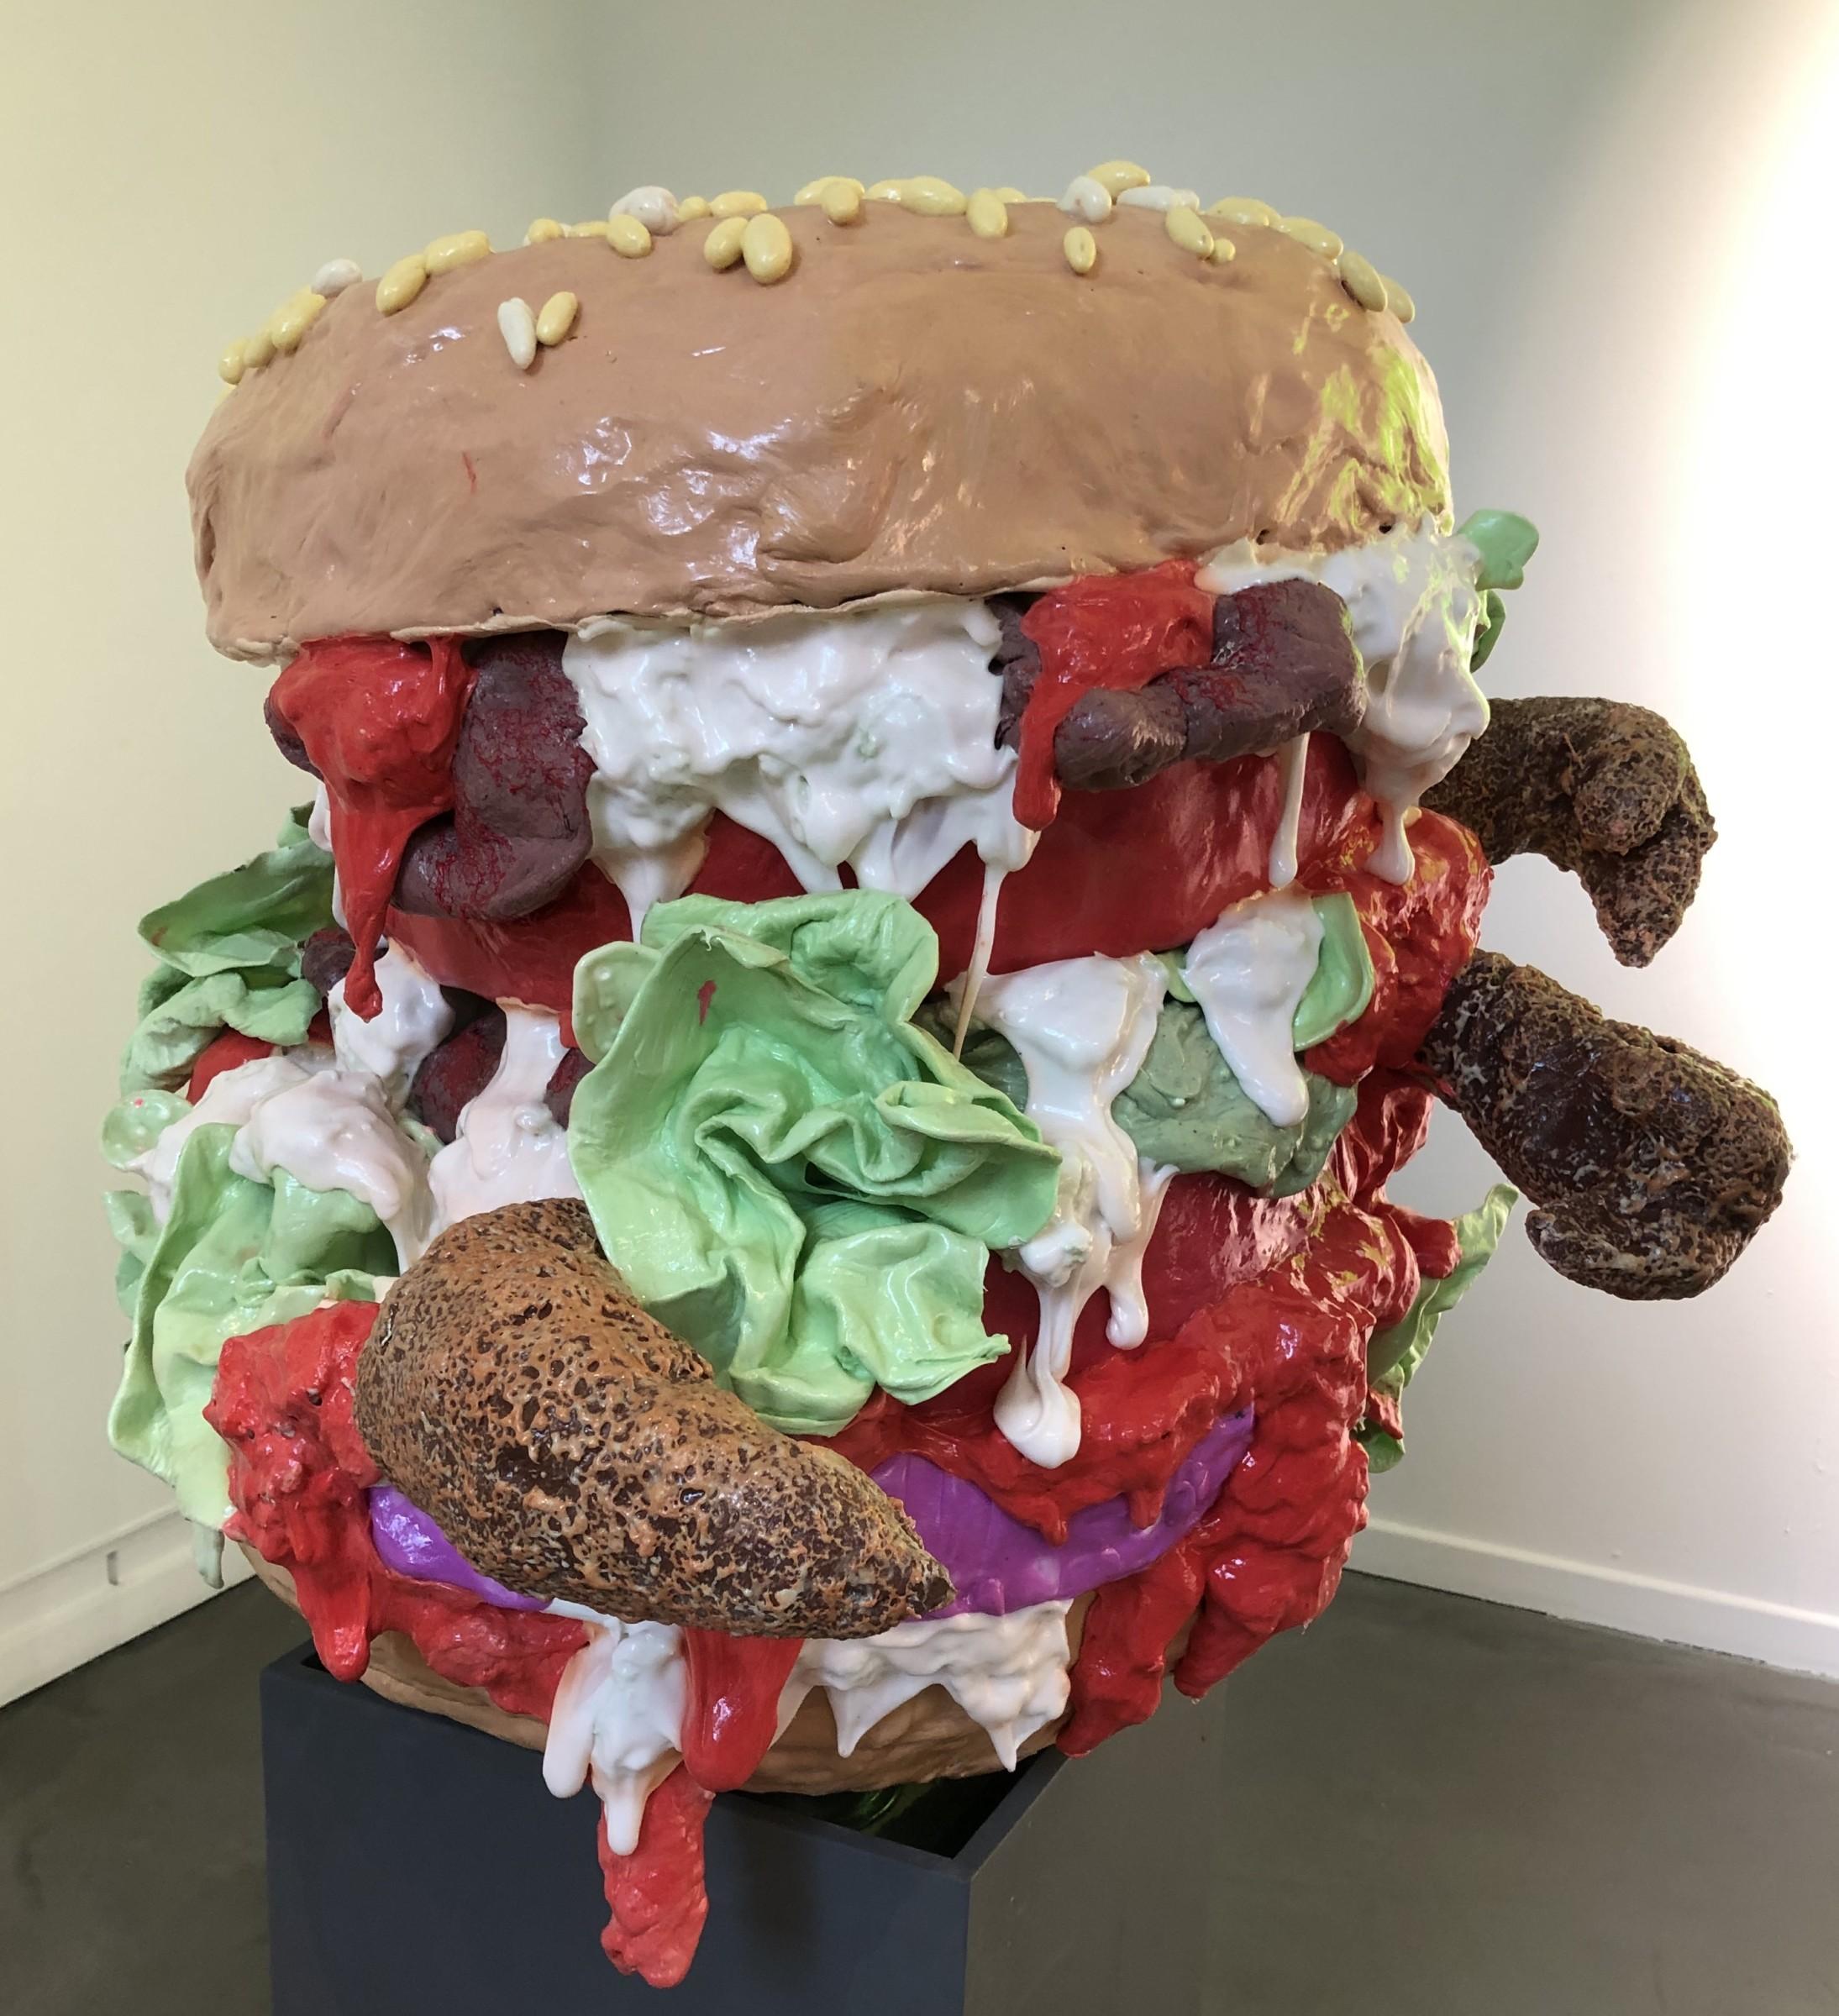 "<span class=""link fancybox-details-link""><a href=""/content/viewing-room/22/artworks5628/"">View Detail Page</a></span><div class=""artist""><strong>Stefan Gross</strong></div><div class=""title""><em>Hamburger</em>, 2019</div><div class=""medium"">Oil plastic</div><div class=""dimensions"">123 x 100 cm</div>€ 6,500.00"